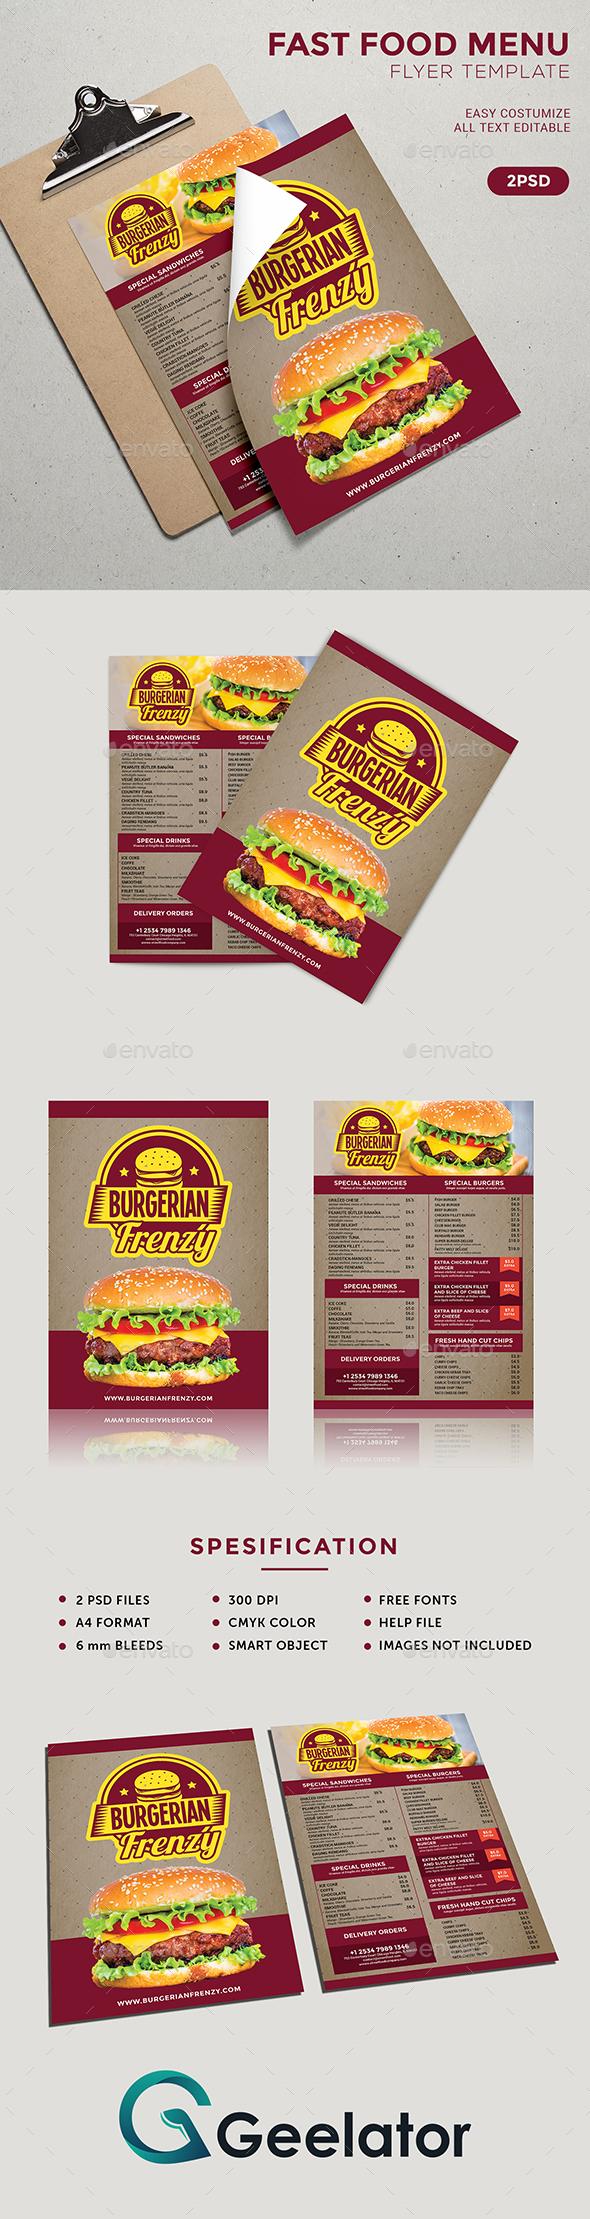 Fast Food Menu Flyer Template - Food Menus Print Templates